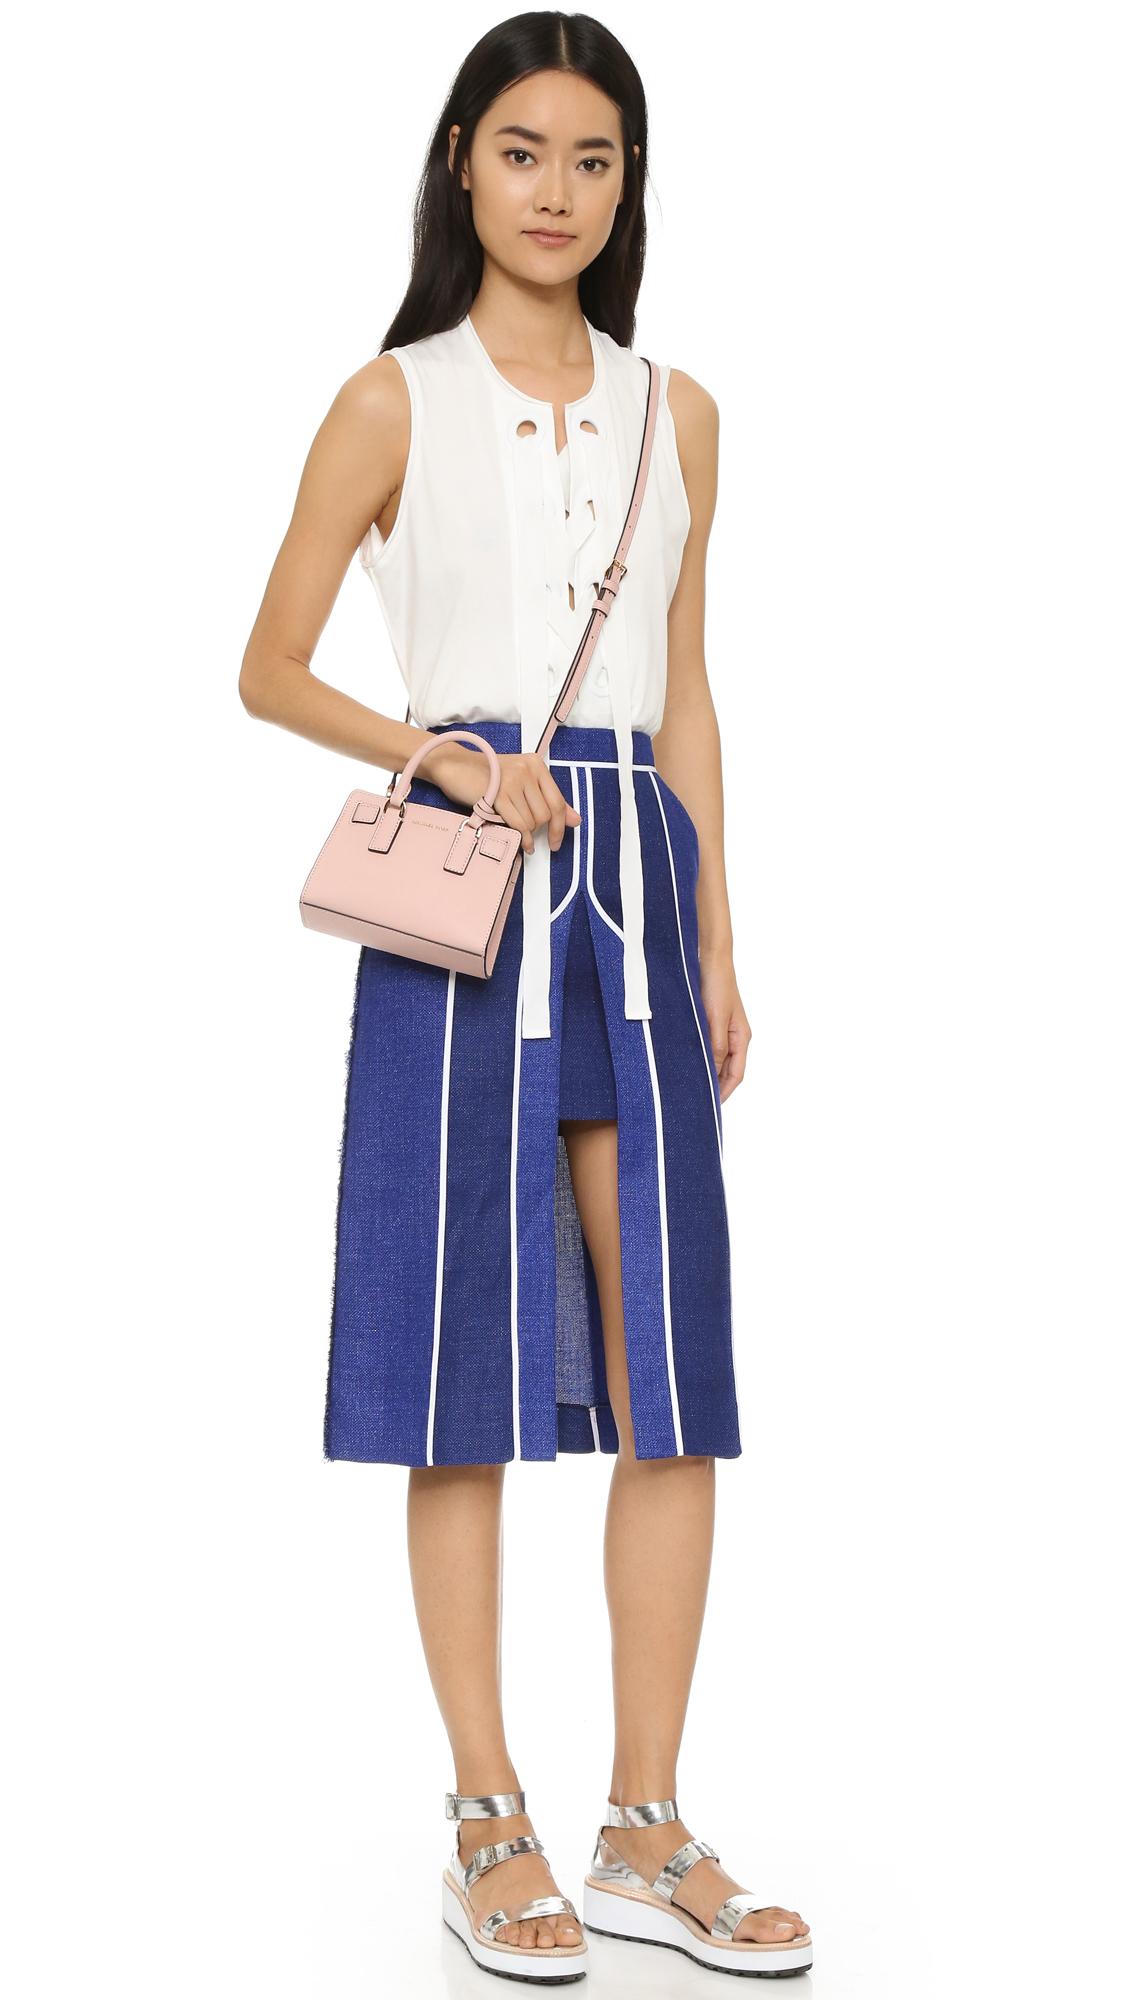 b68425286941 MICHAEL Michael Kors Dillon Saffiano-Leather Cross-Body Bag in Pink - Lyst